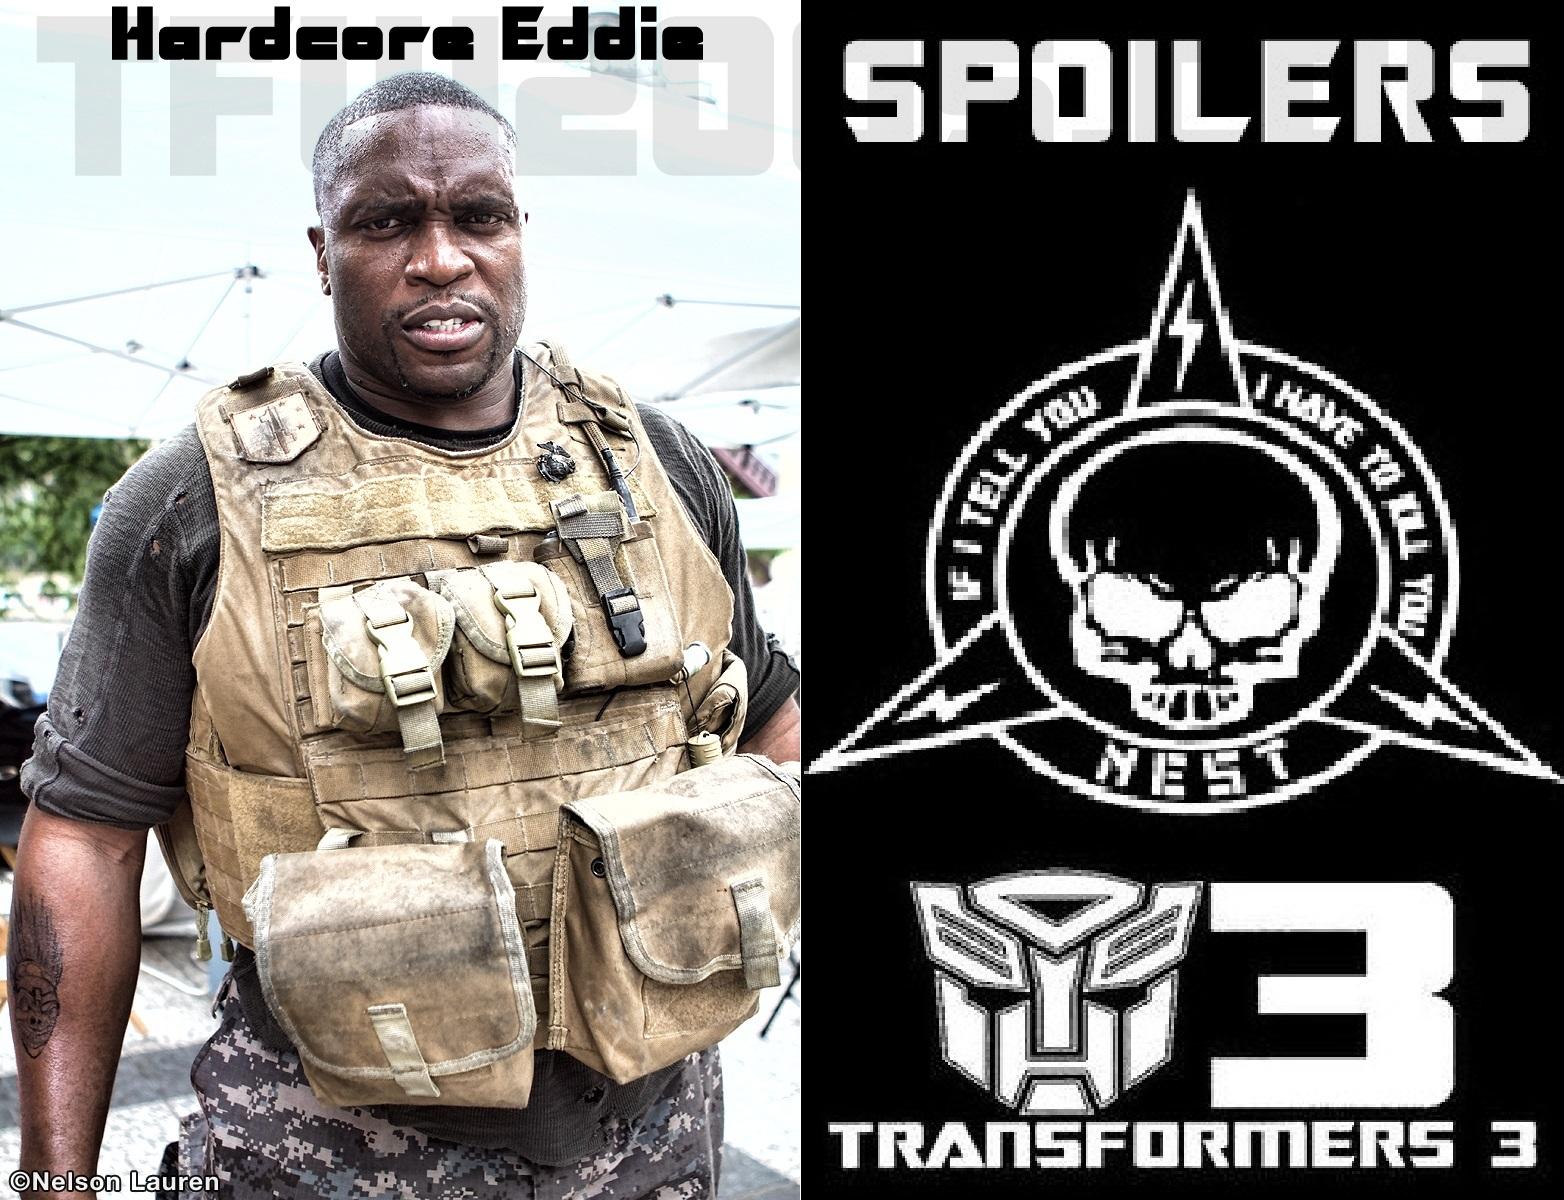 Hardcore-Eddie